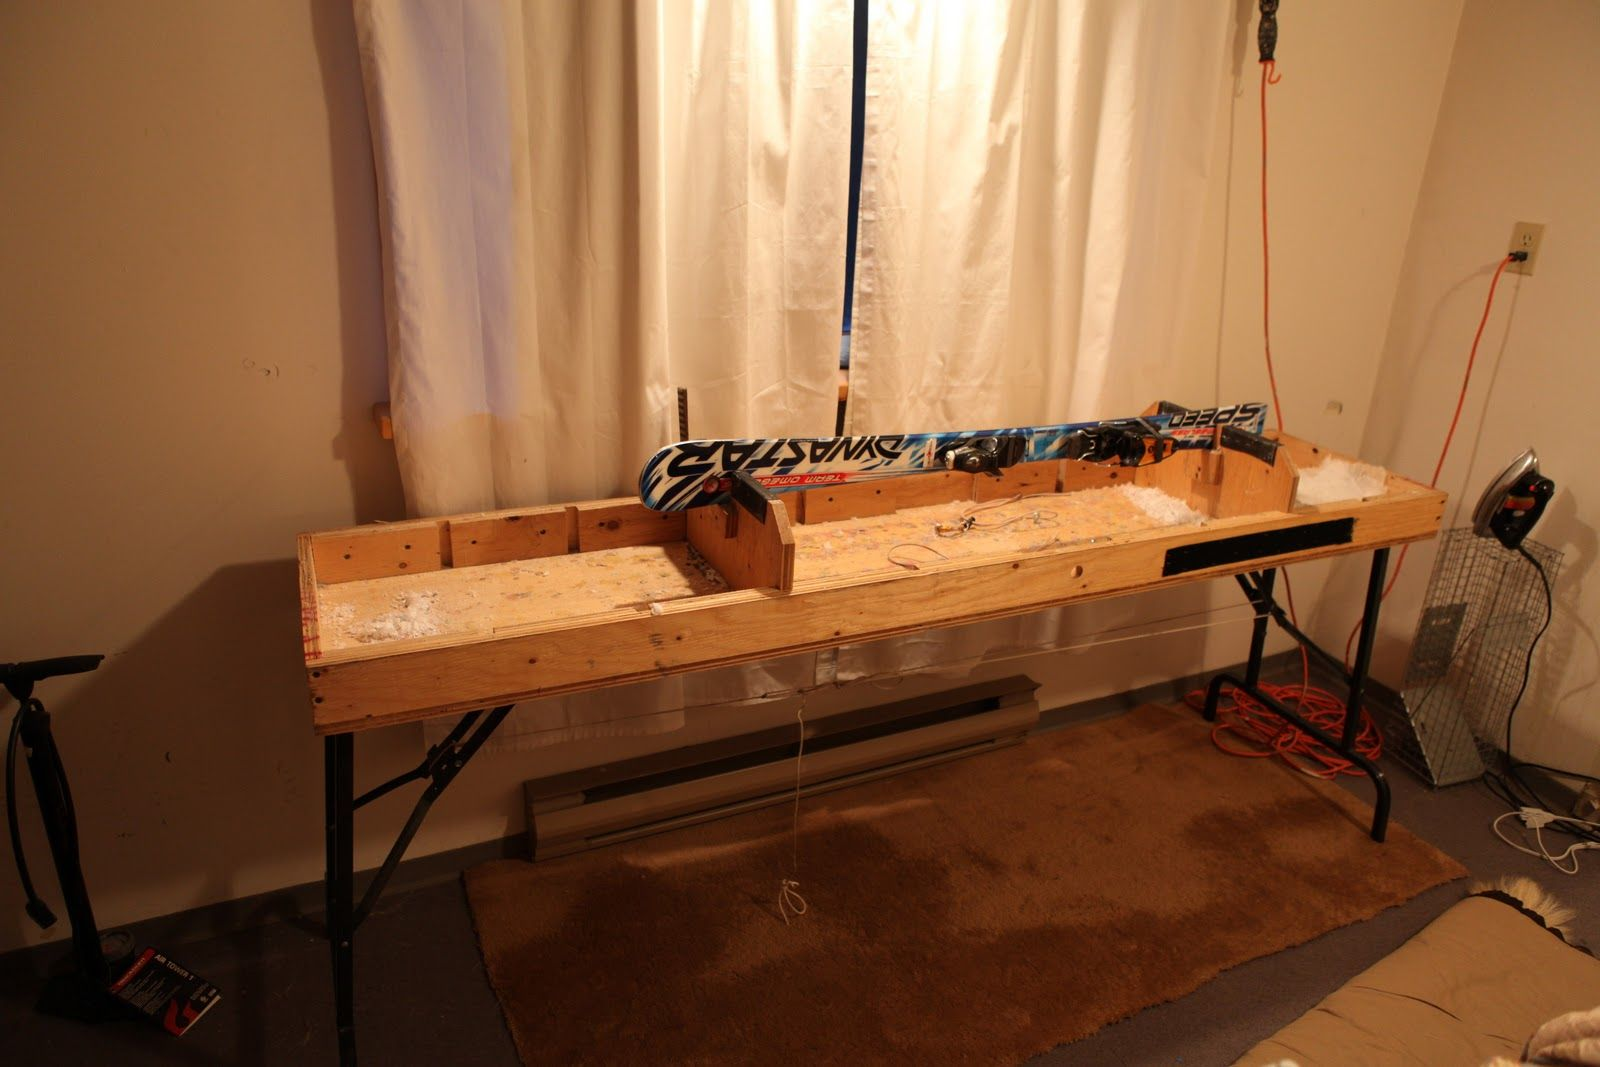 Ski Tuning Table With Ski With Edge Up Skiing Vises Bike Room